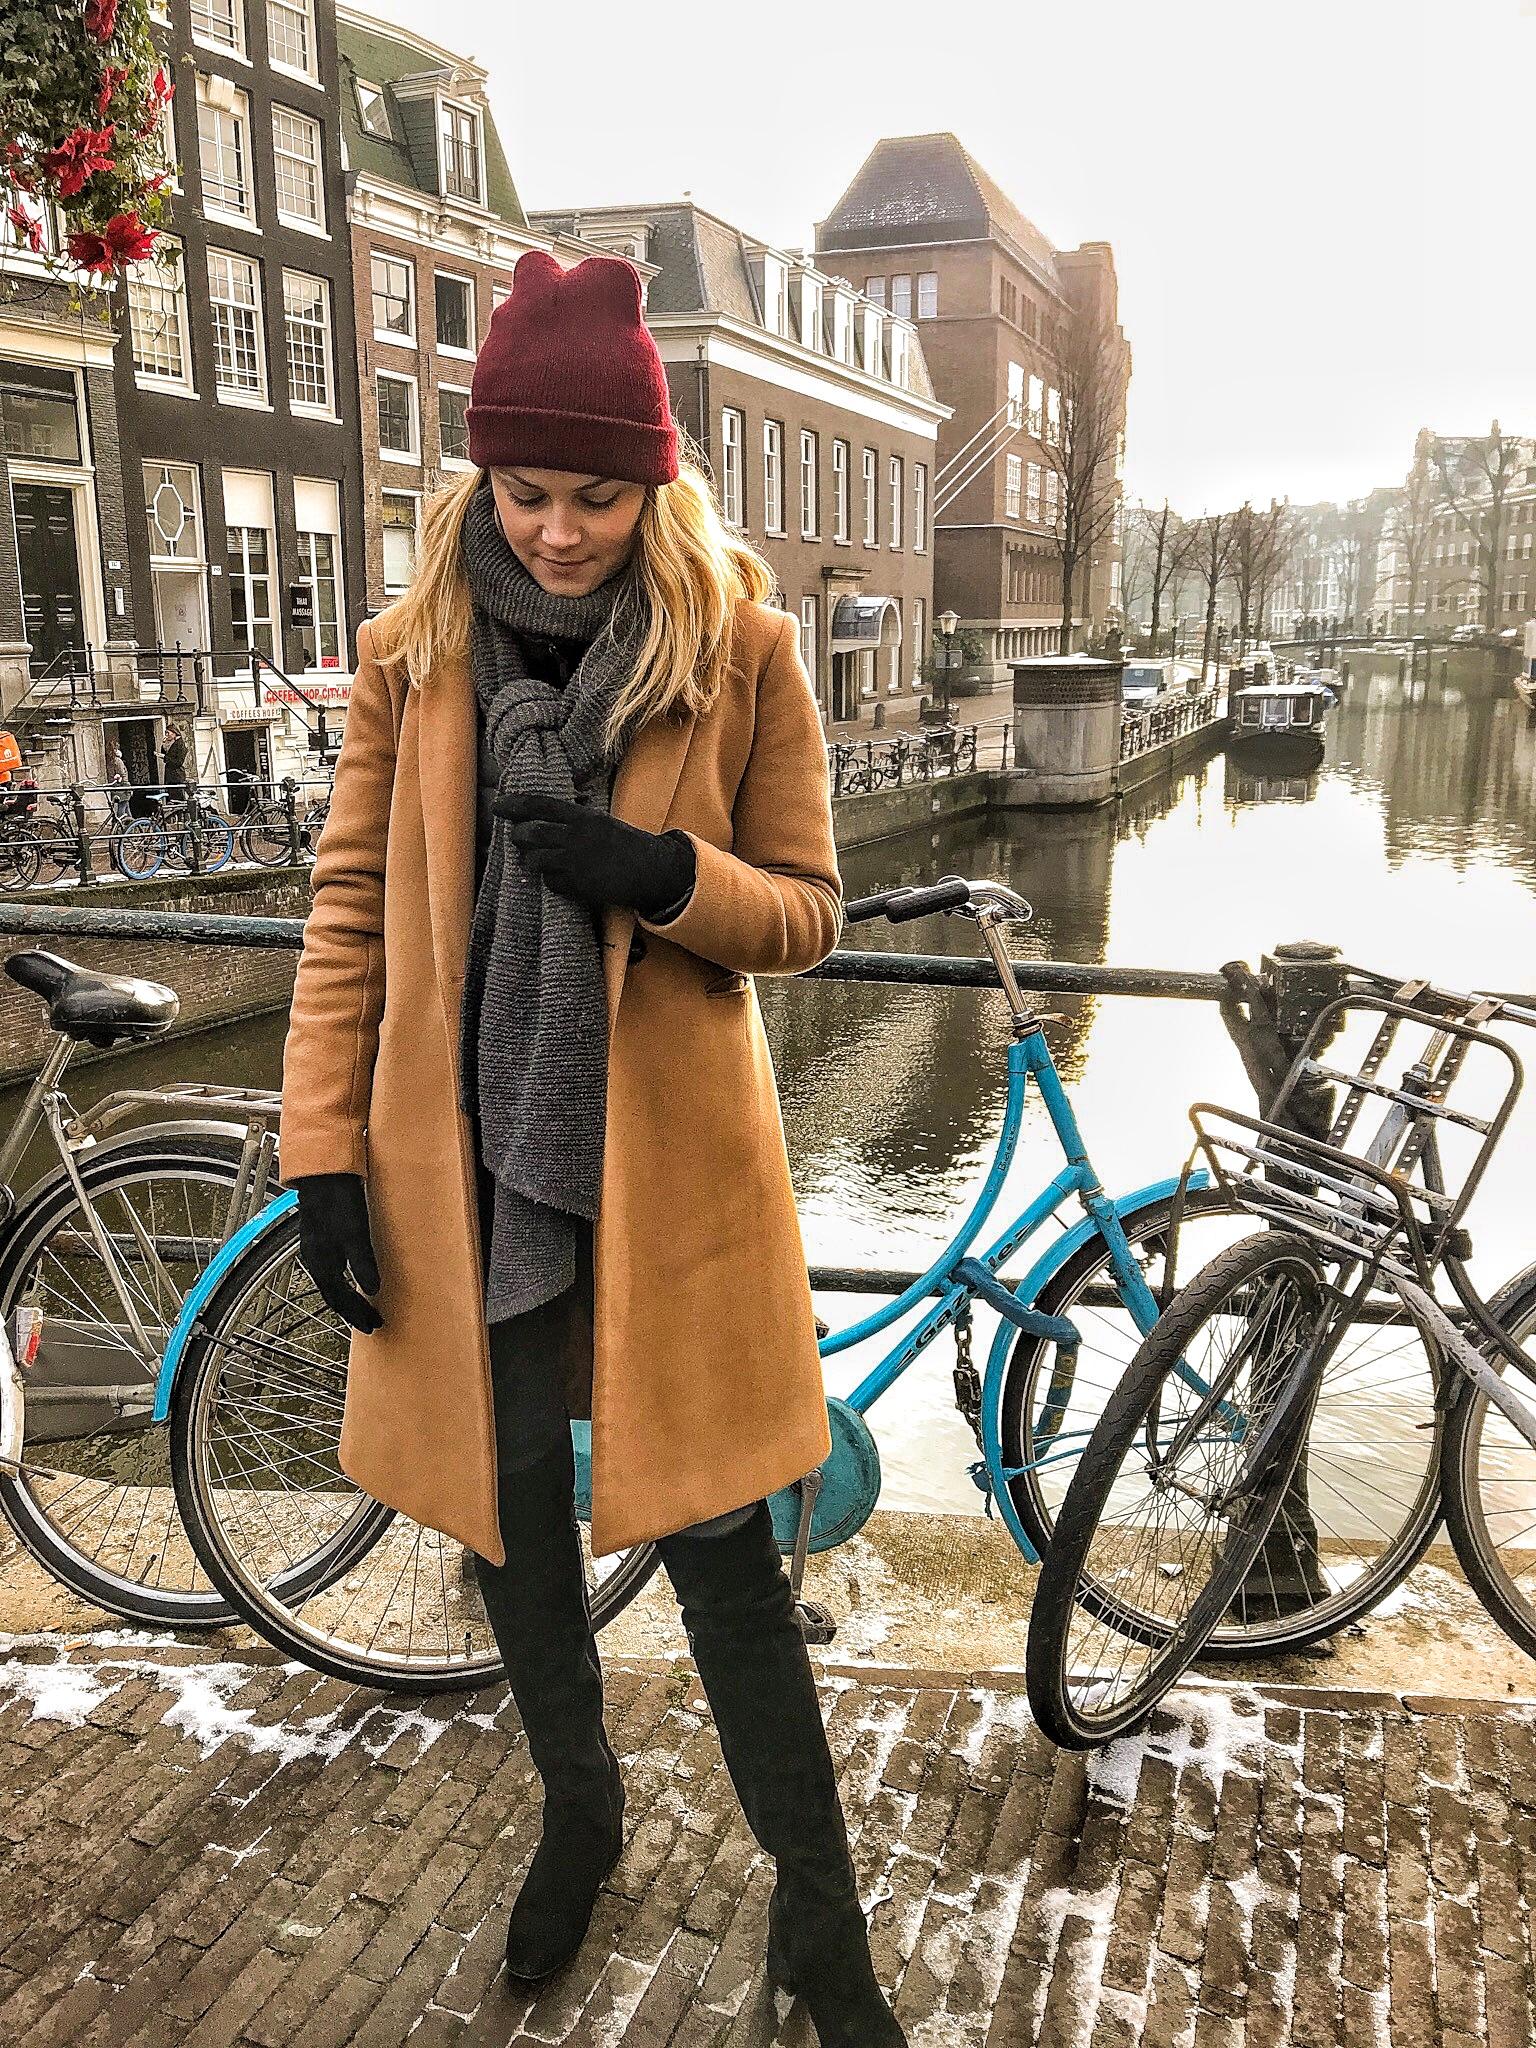 Bonnes adresses food à Amsterdam